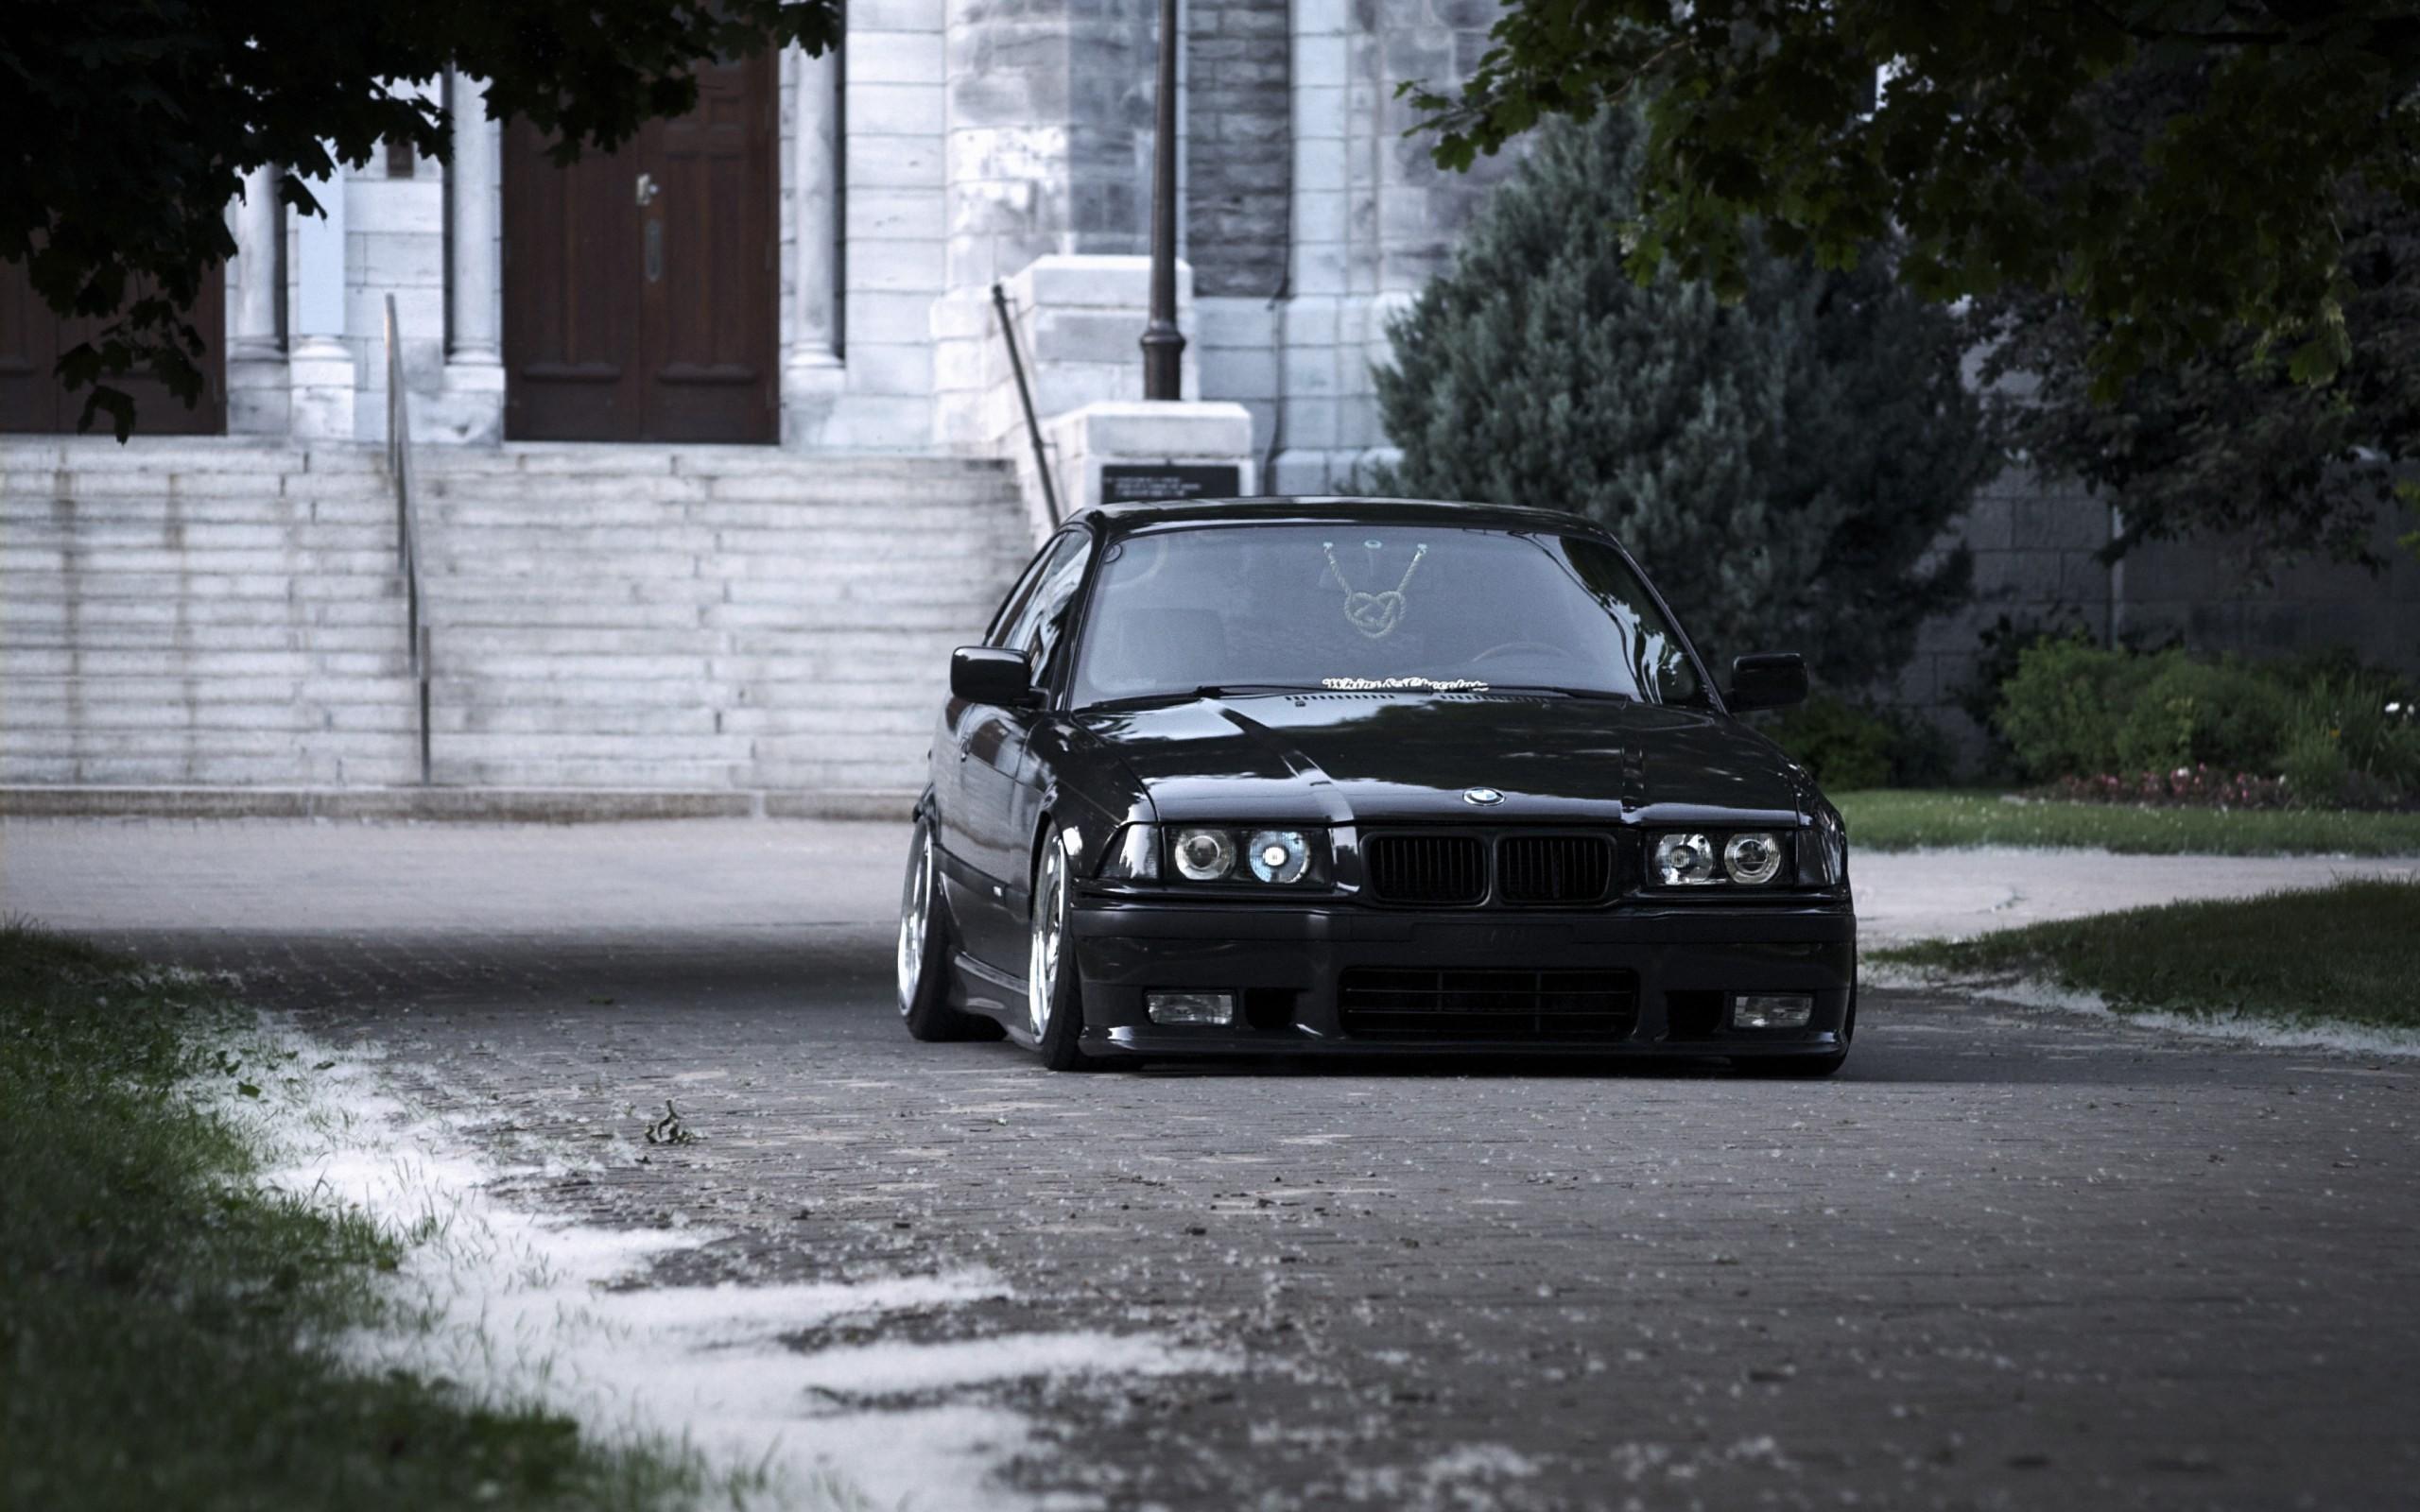 BMW E36 Wallpaper 61 images 2560x1600